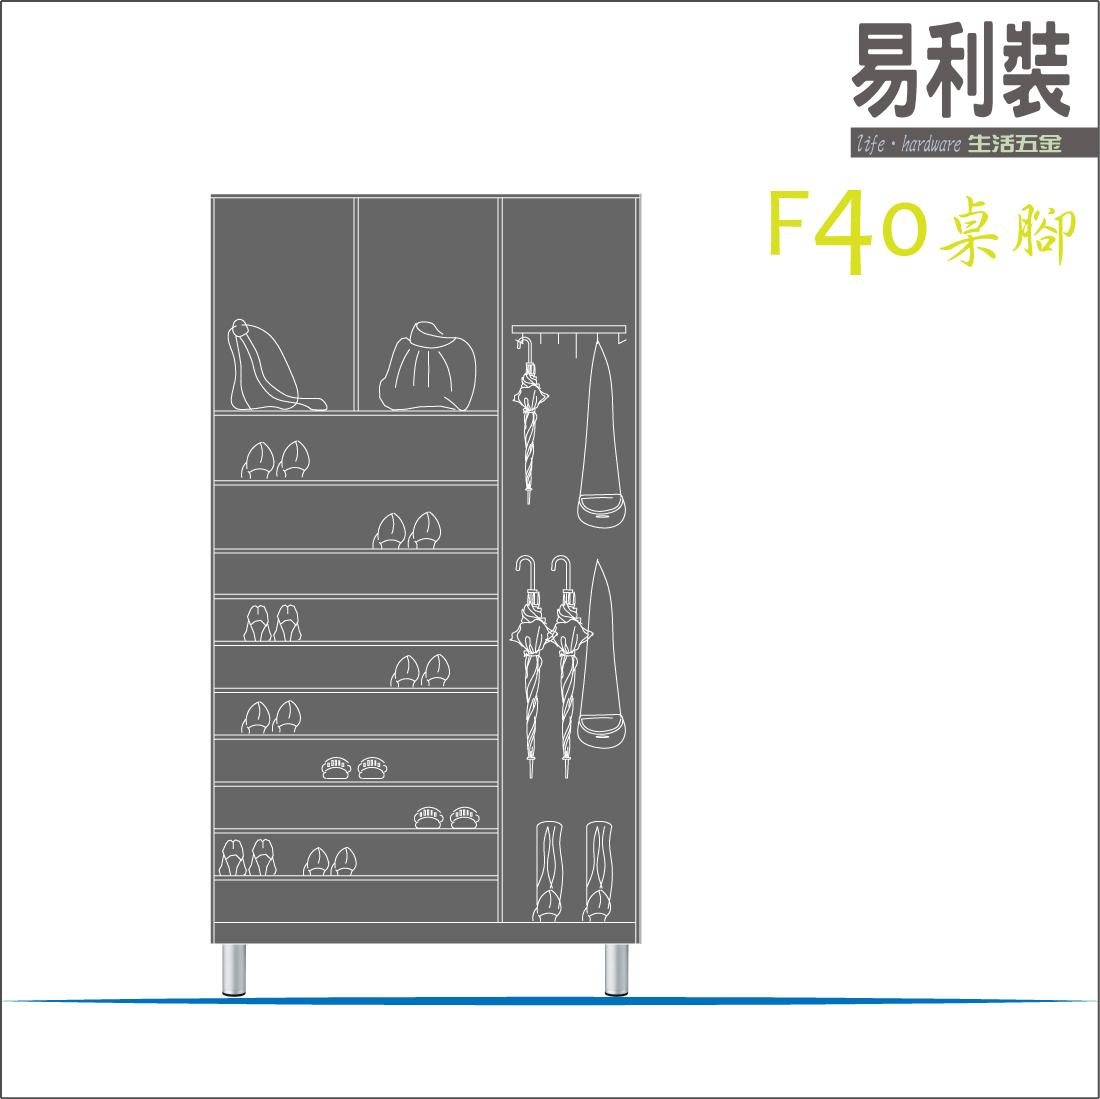 【 EASYCAN  】F40 餐桌腳 易利裝生活五金 櫥櫃腳 衣櫃腳 鞋櫃腳 書櫃腳 鋁合金  房間 臥房 衣櫃 小資族 辦公家具 系統家具